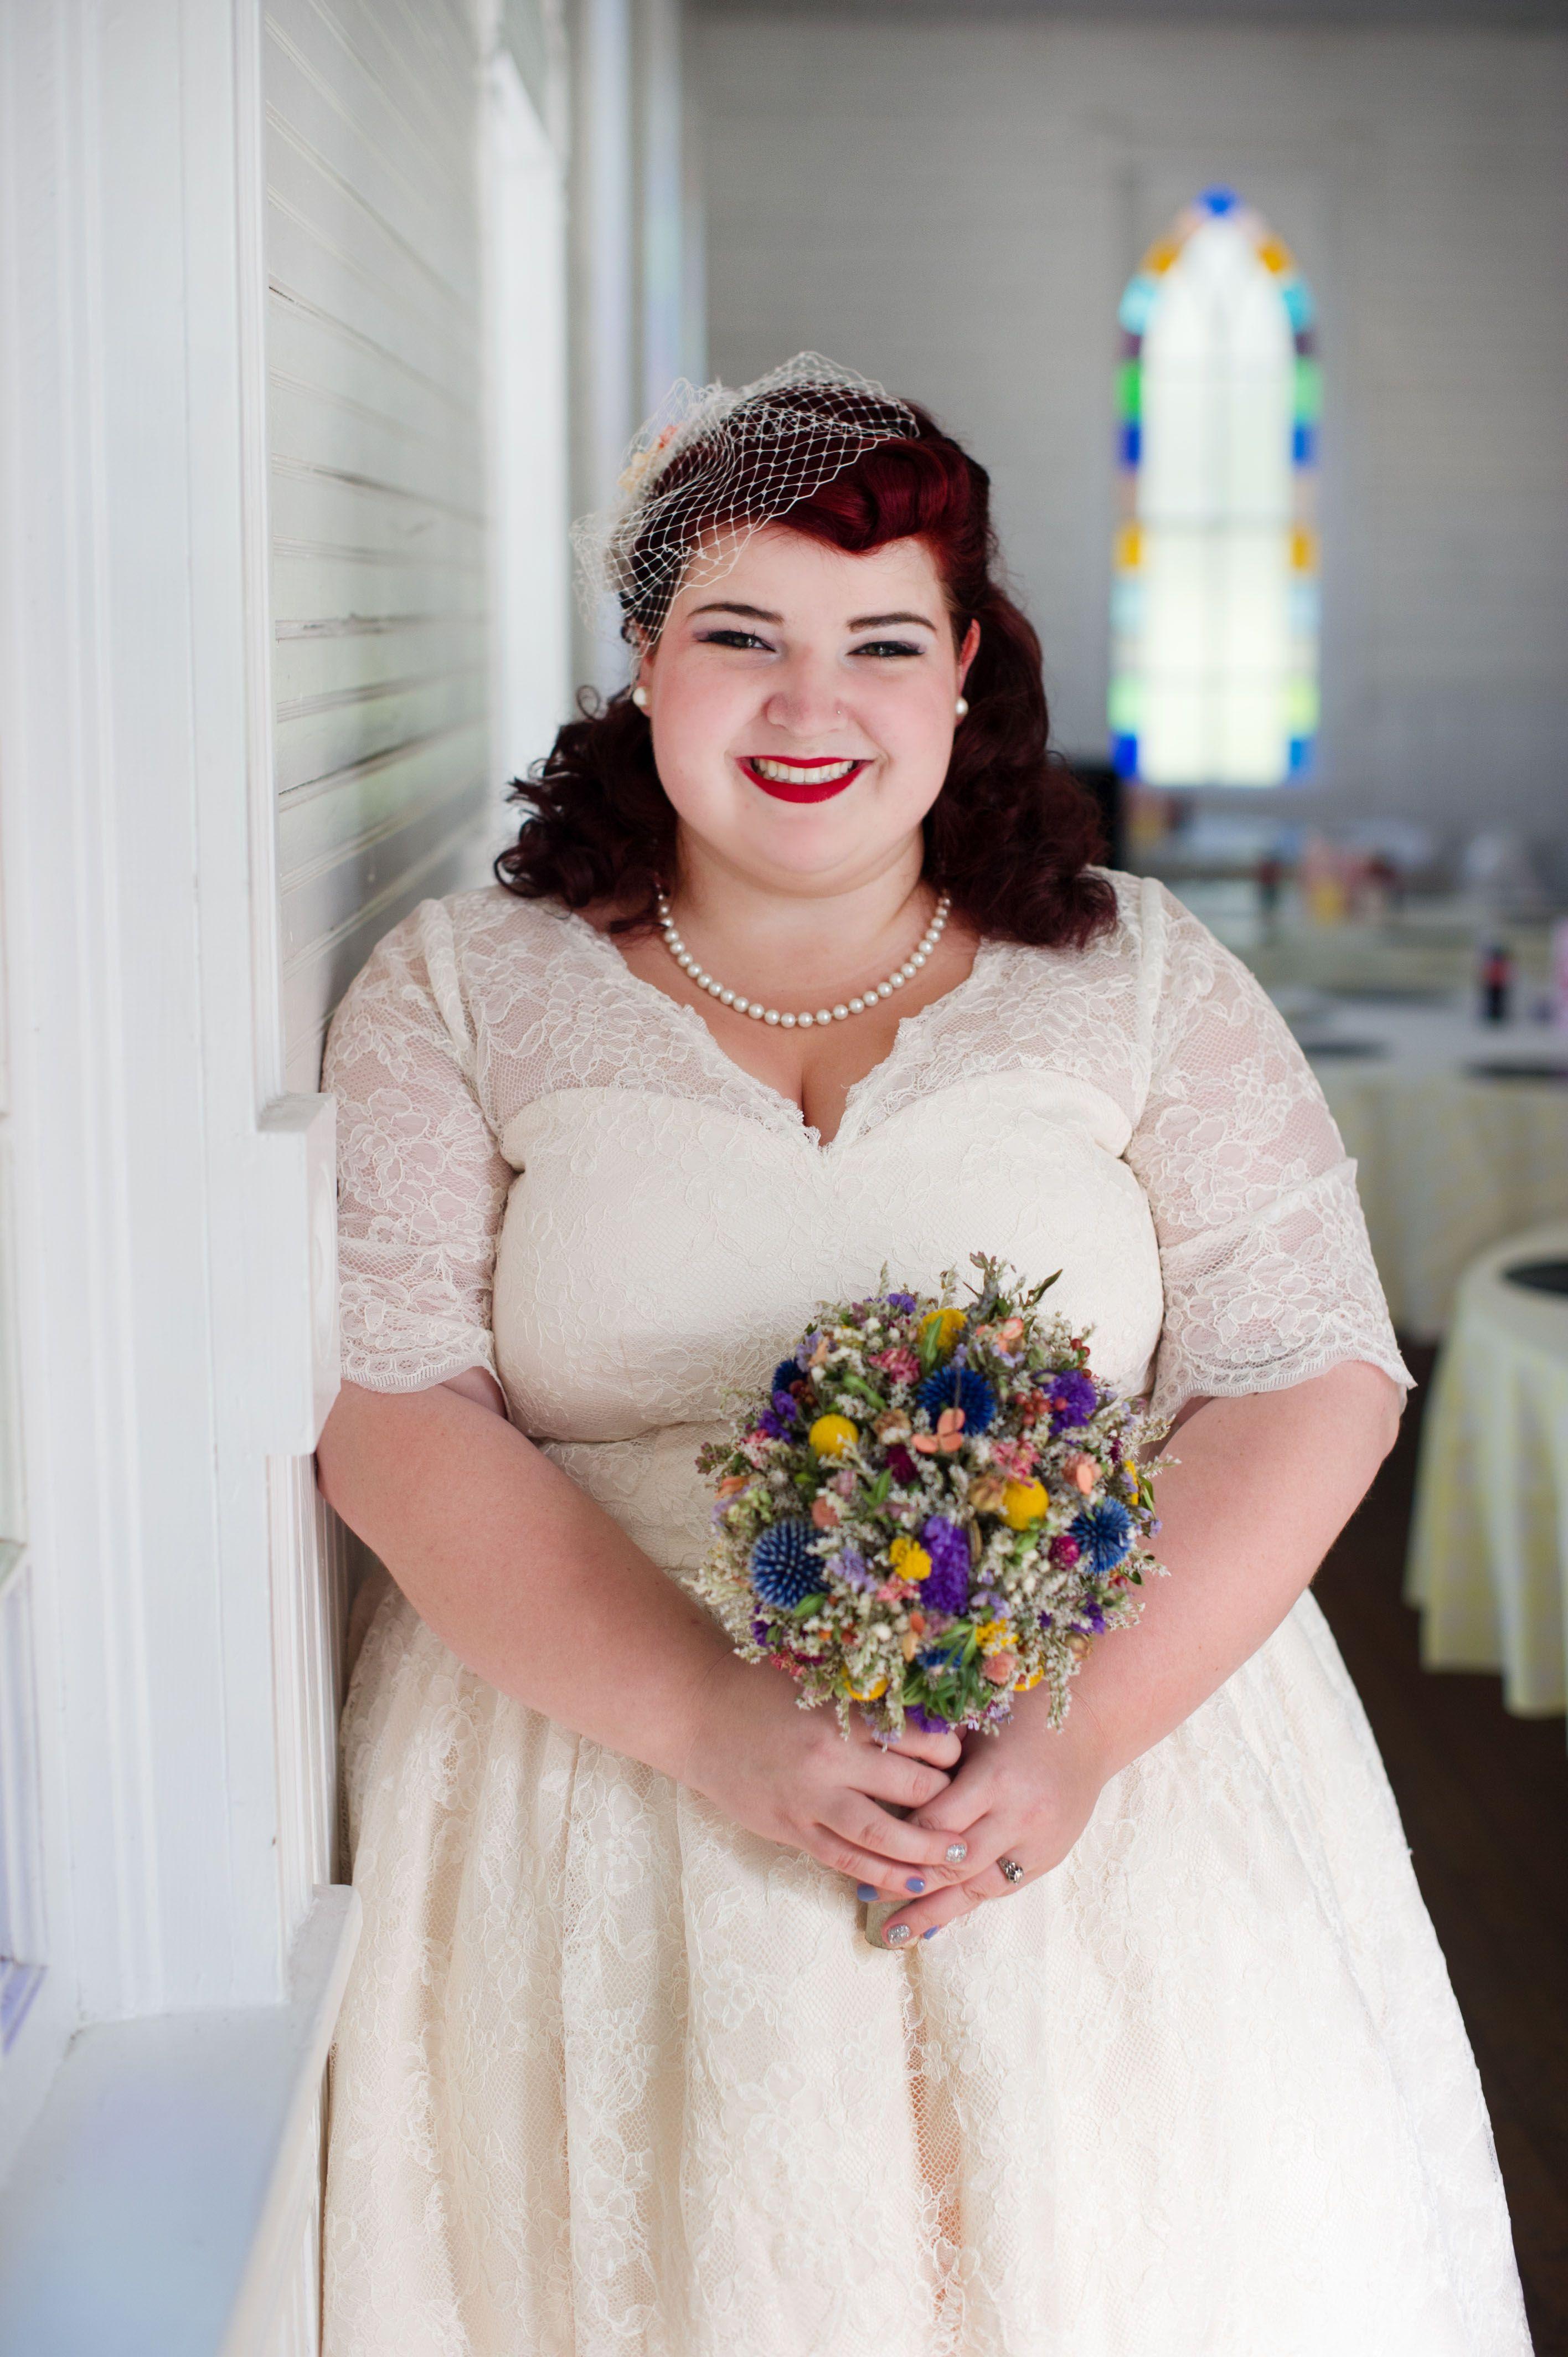 Vintage-50s-Inspired-Jewish-Wedding-Jenna-Leigh-Photo-11.jpg 2,832×4,256 pixels